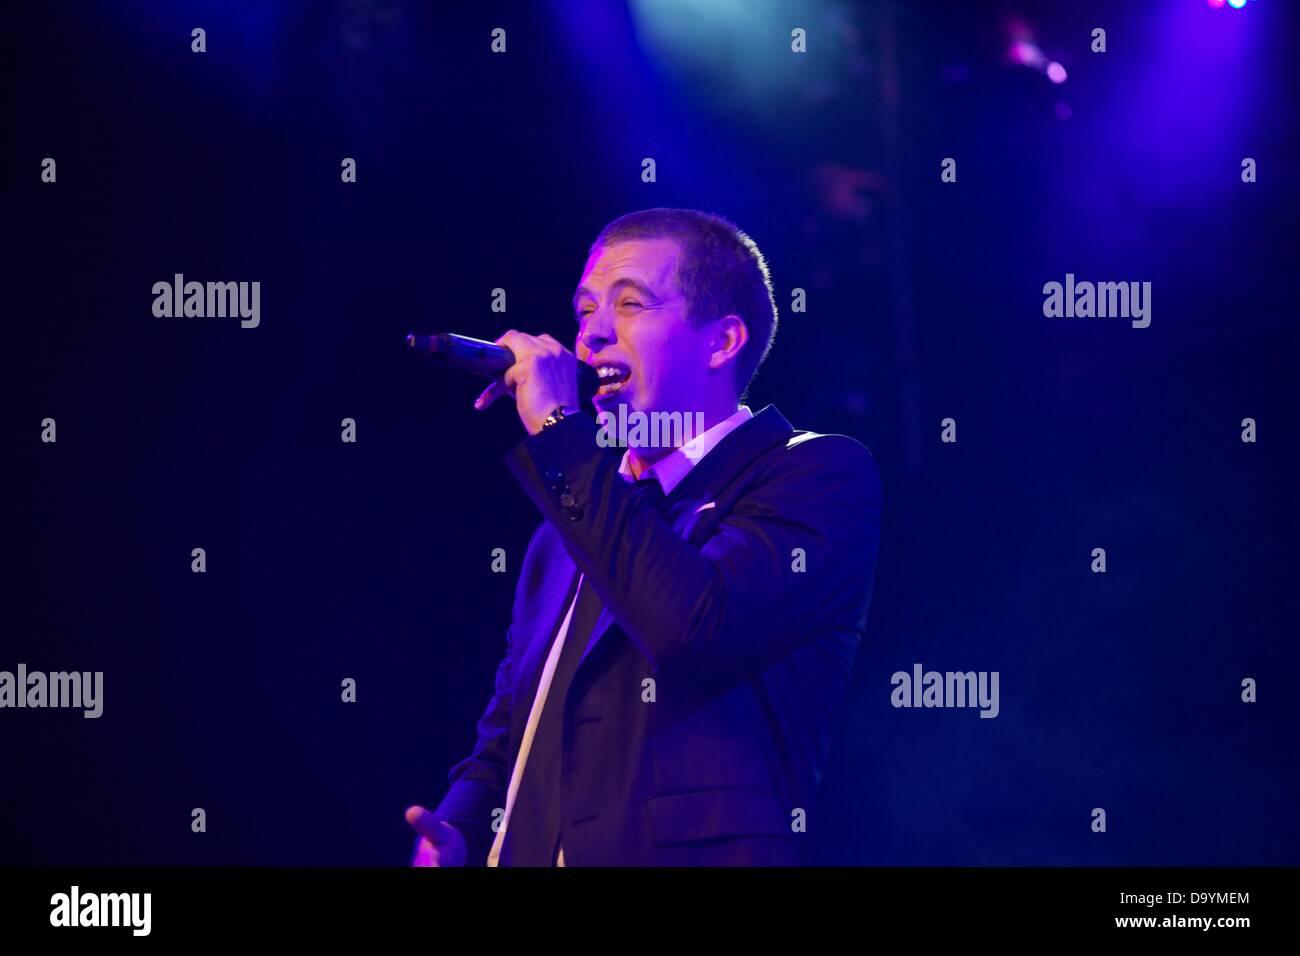 Quebec, Canada. 28th June 2013. 'Rod le Stod' performing at the show' Bal des chansonneurs', part - Stock Image